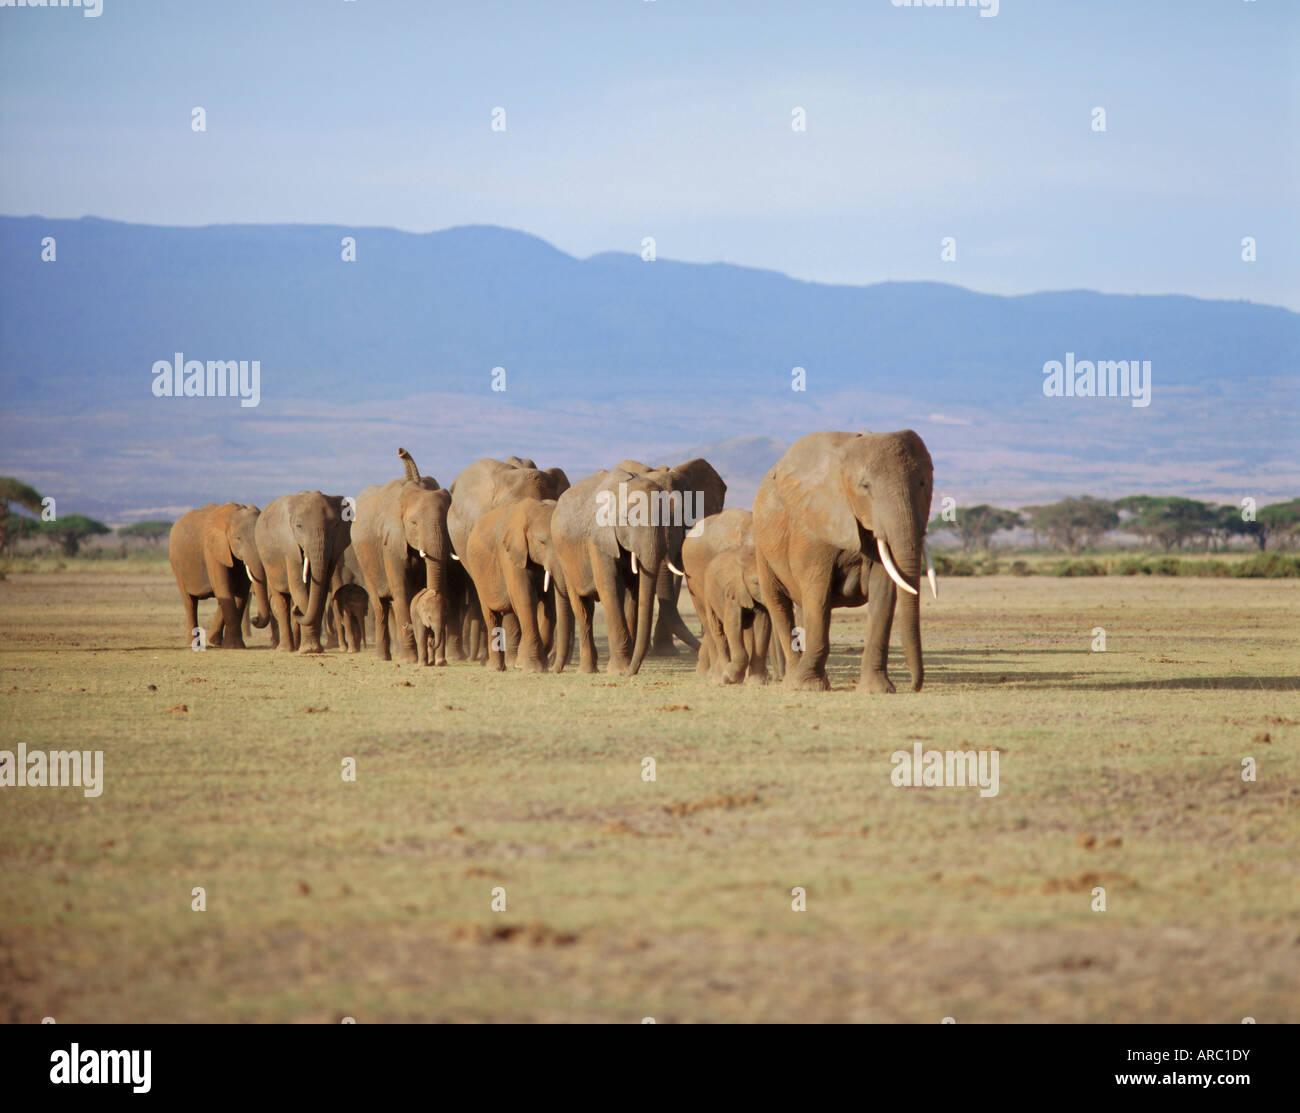 A group of elephants including young, Amboseli National Park, Kenya - Stock Image